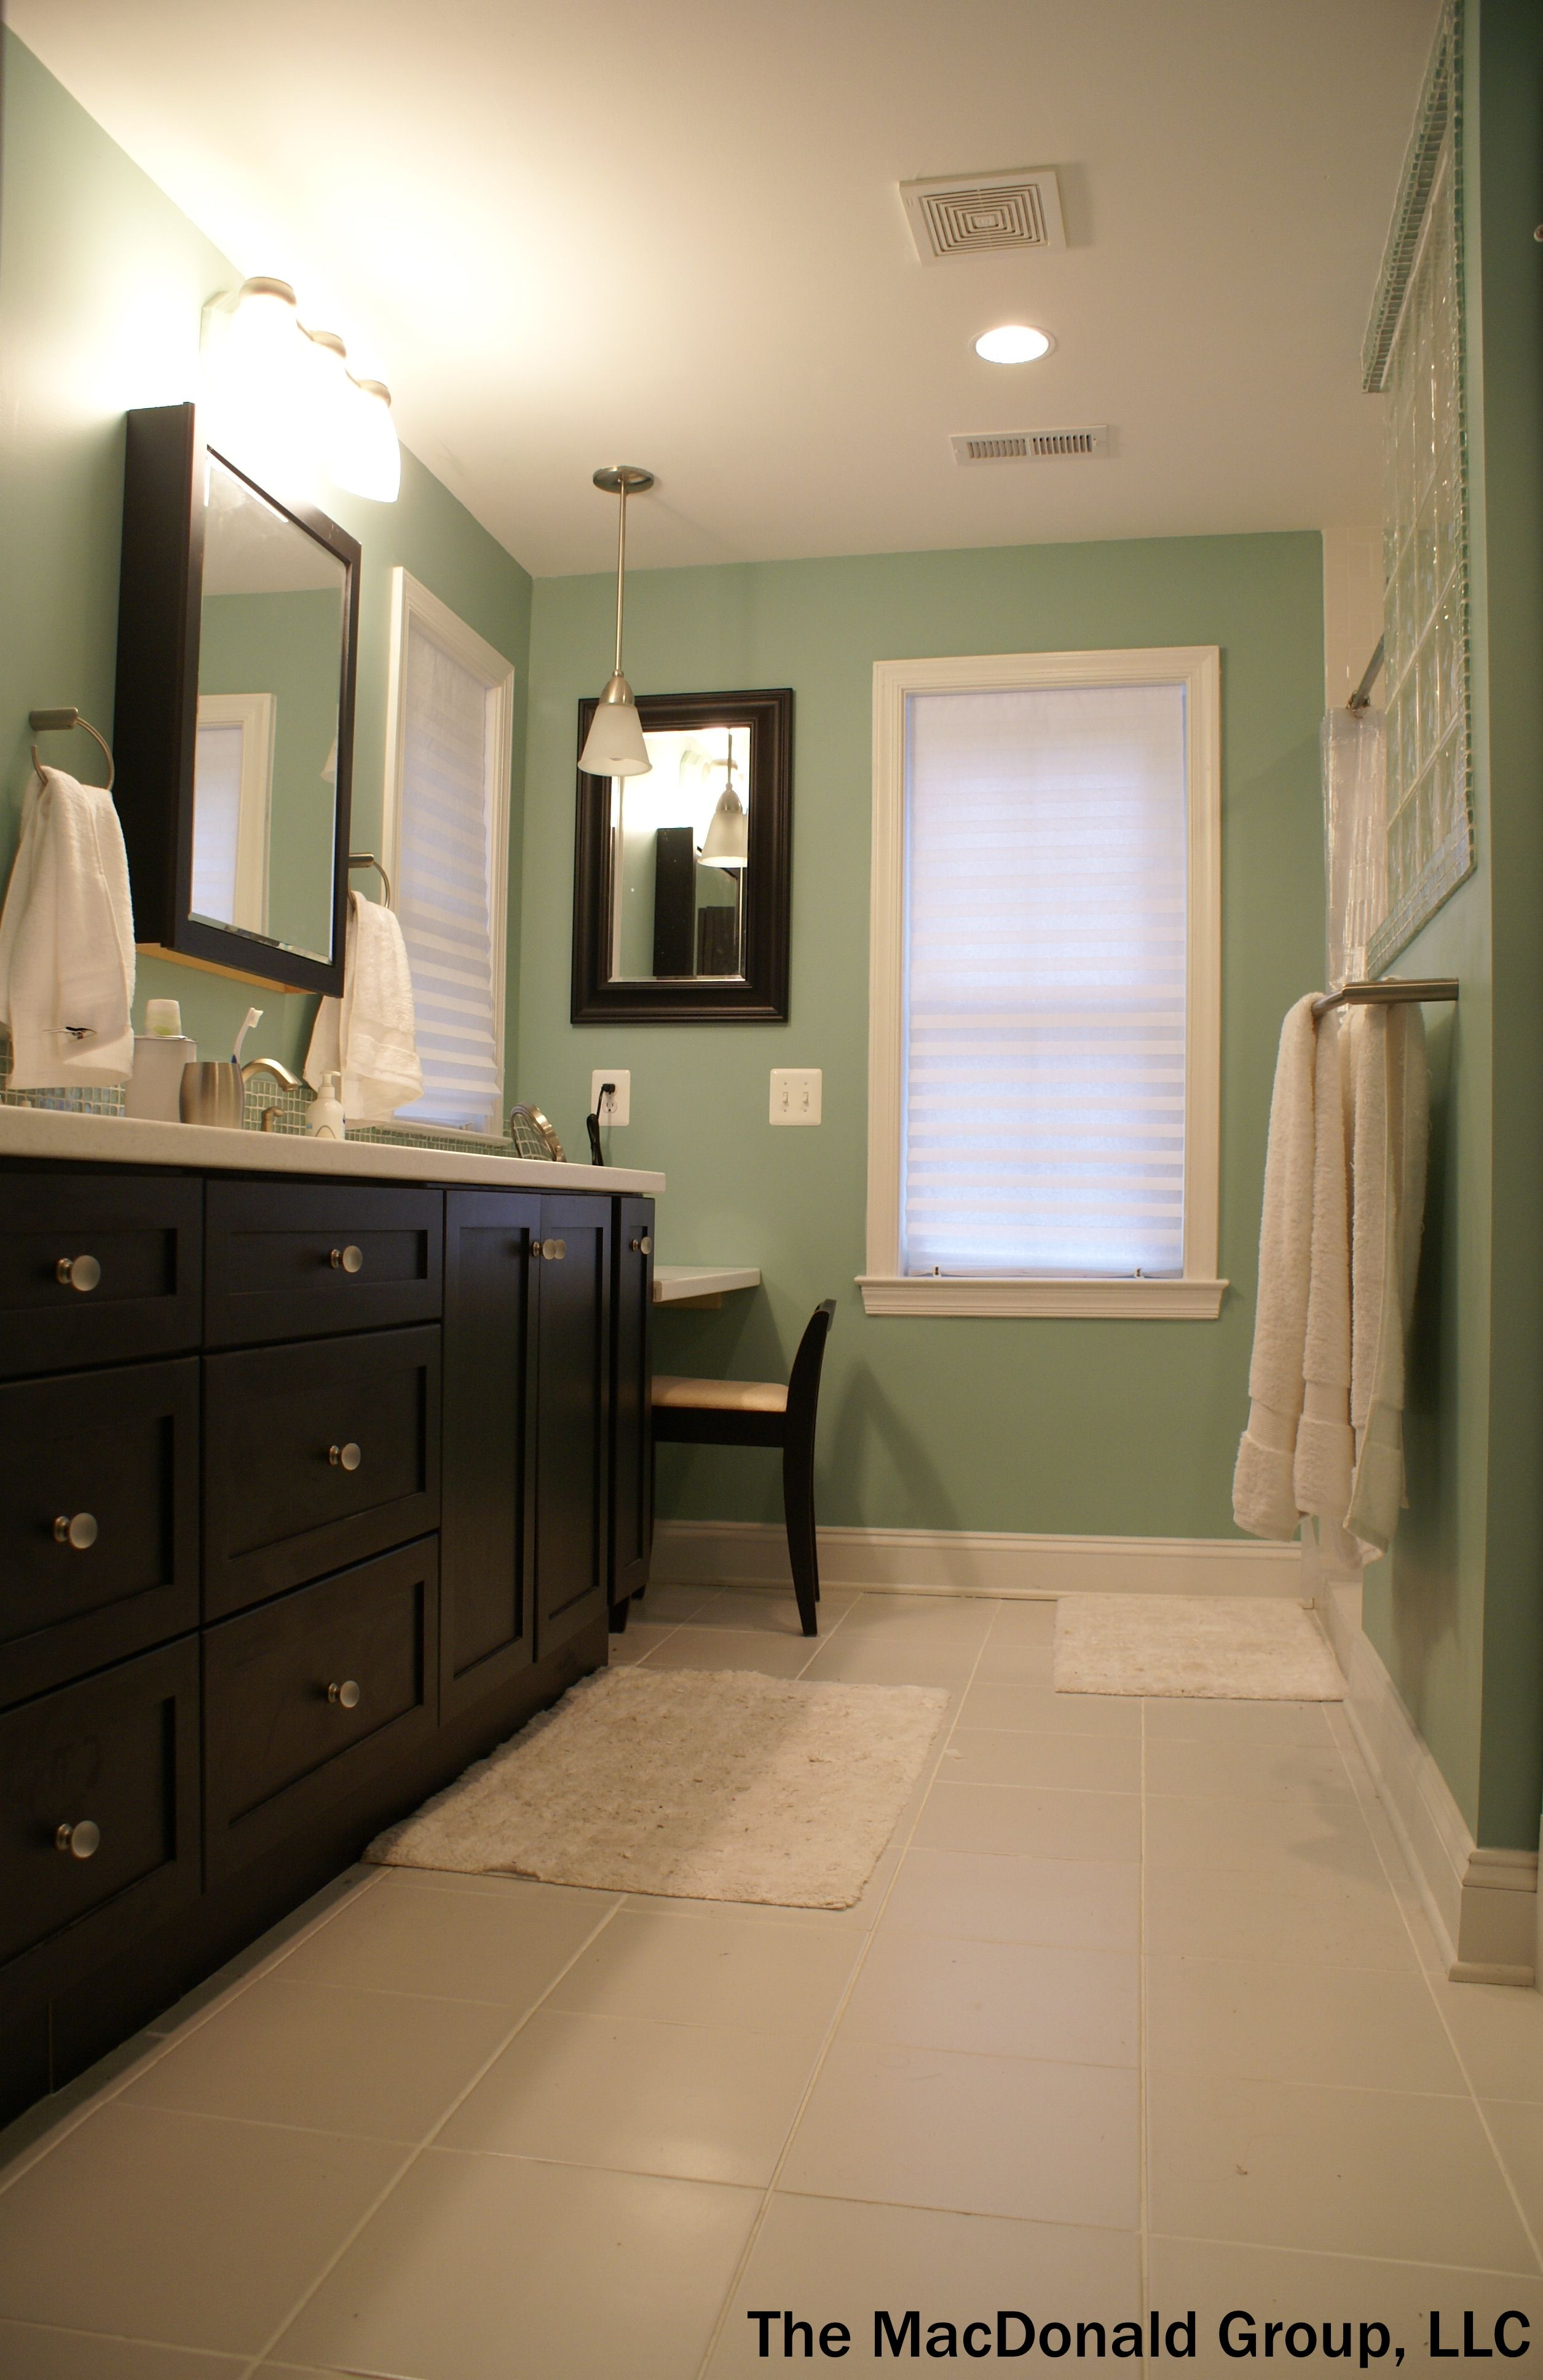 Bathroom Renovation Costs Cost To Redo Bathroom Bathroom Renovation Cost Cost To Redo Bathroom Traditional Bathroom